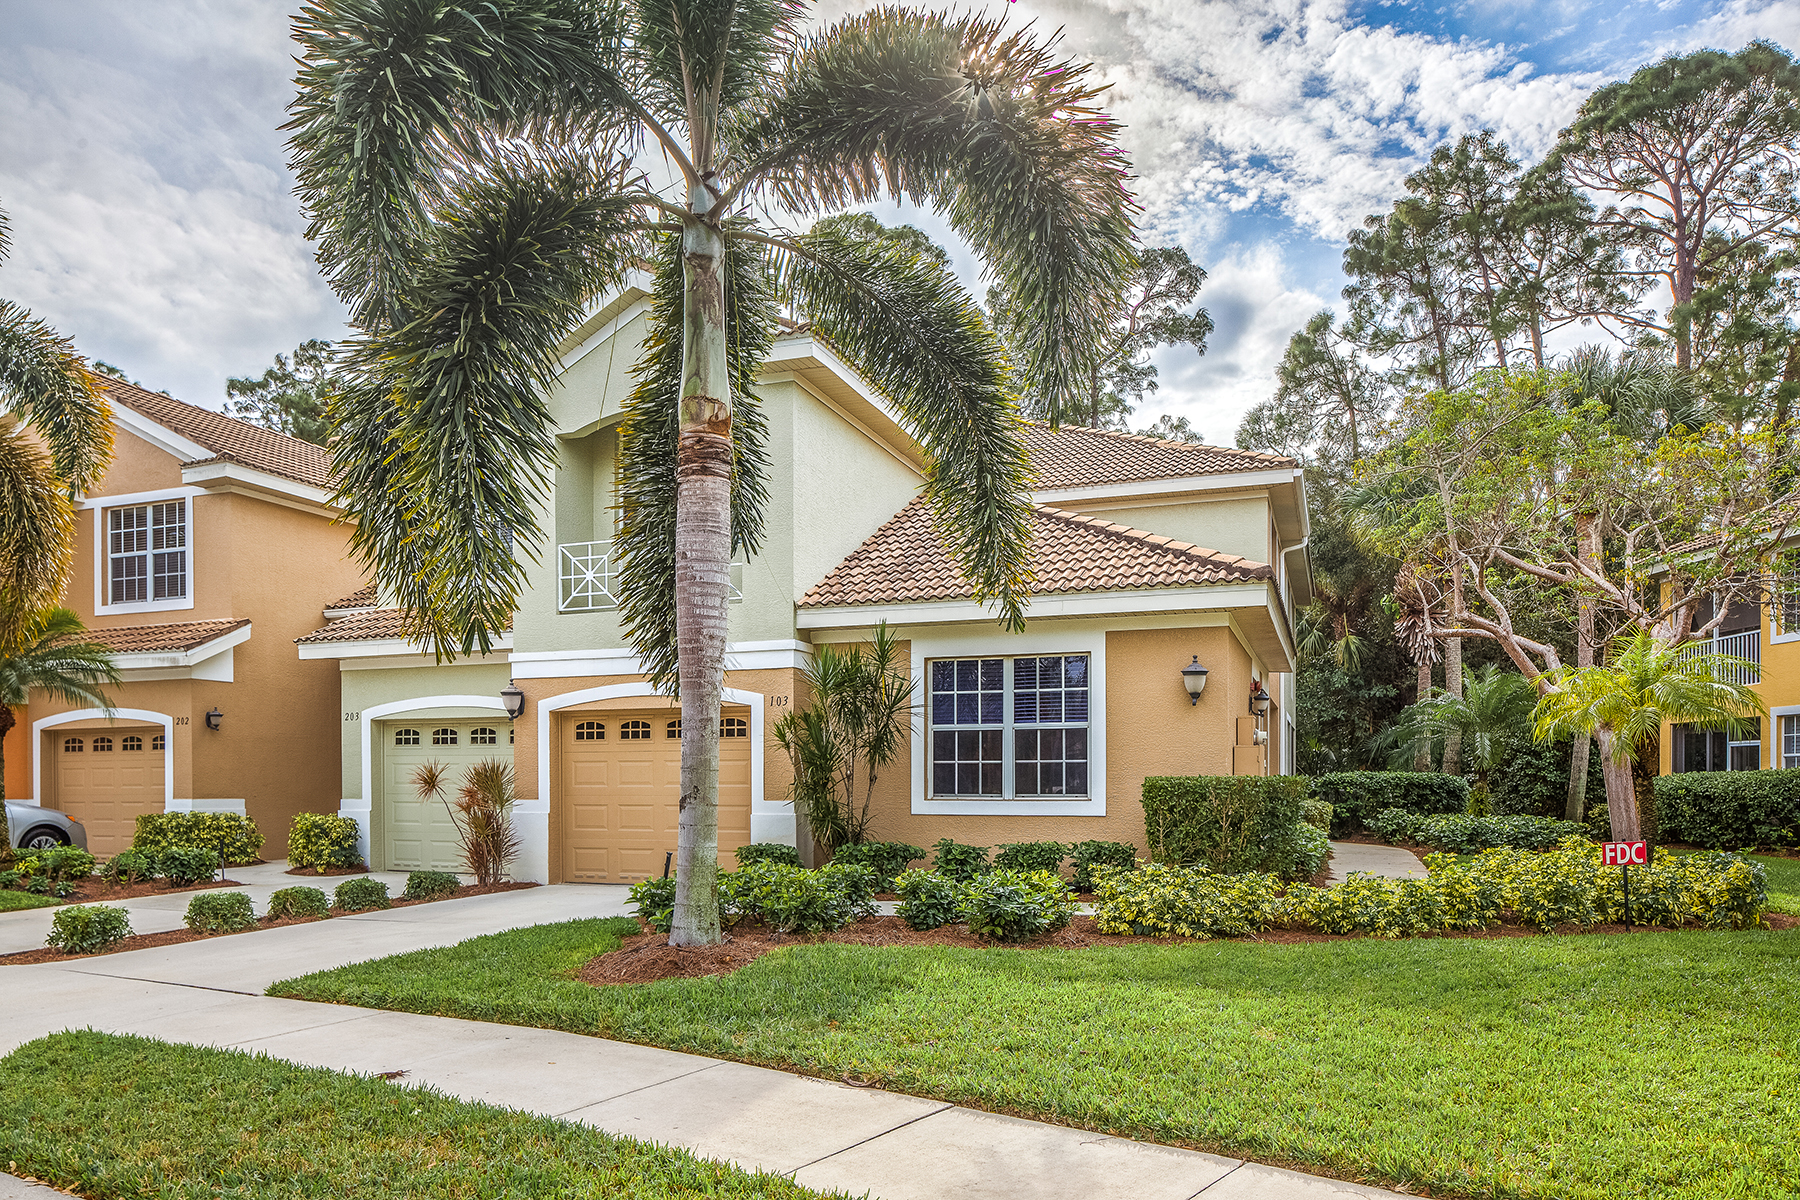 Condomínio para Venda às STONEBRIDGE - BRAEBURN 1675 Winding Oaks Way 103 Naples, Florida, 34109 Estados Unidos